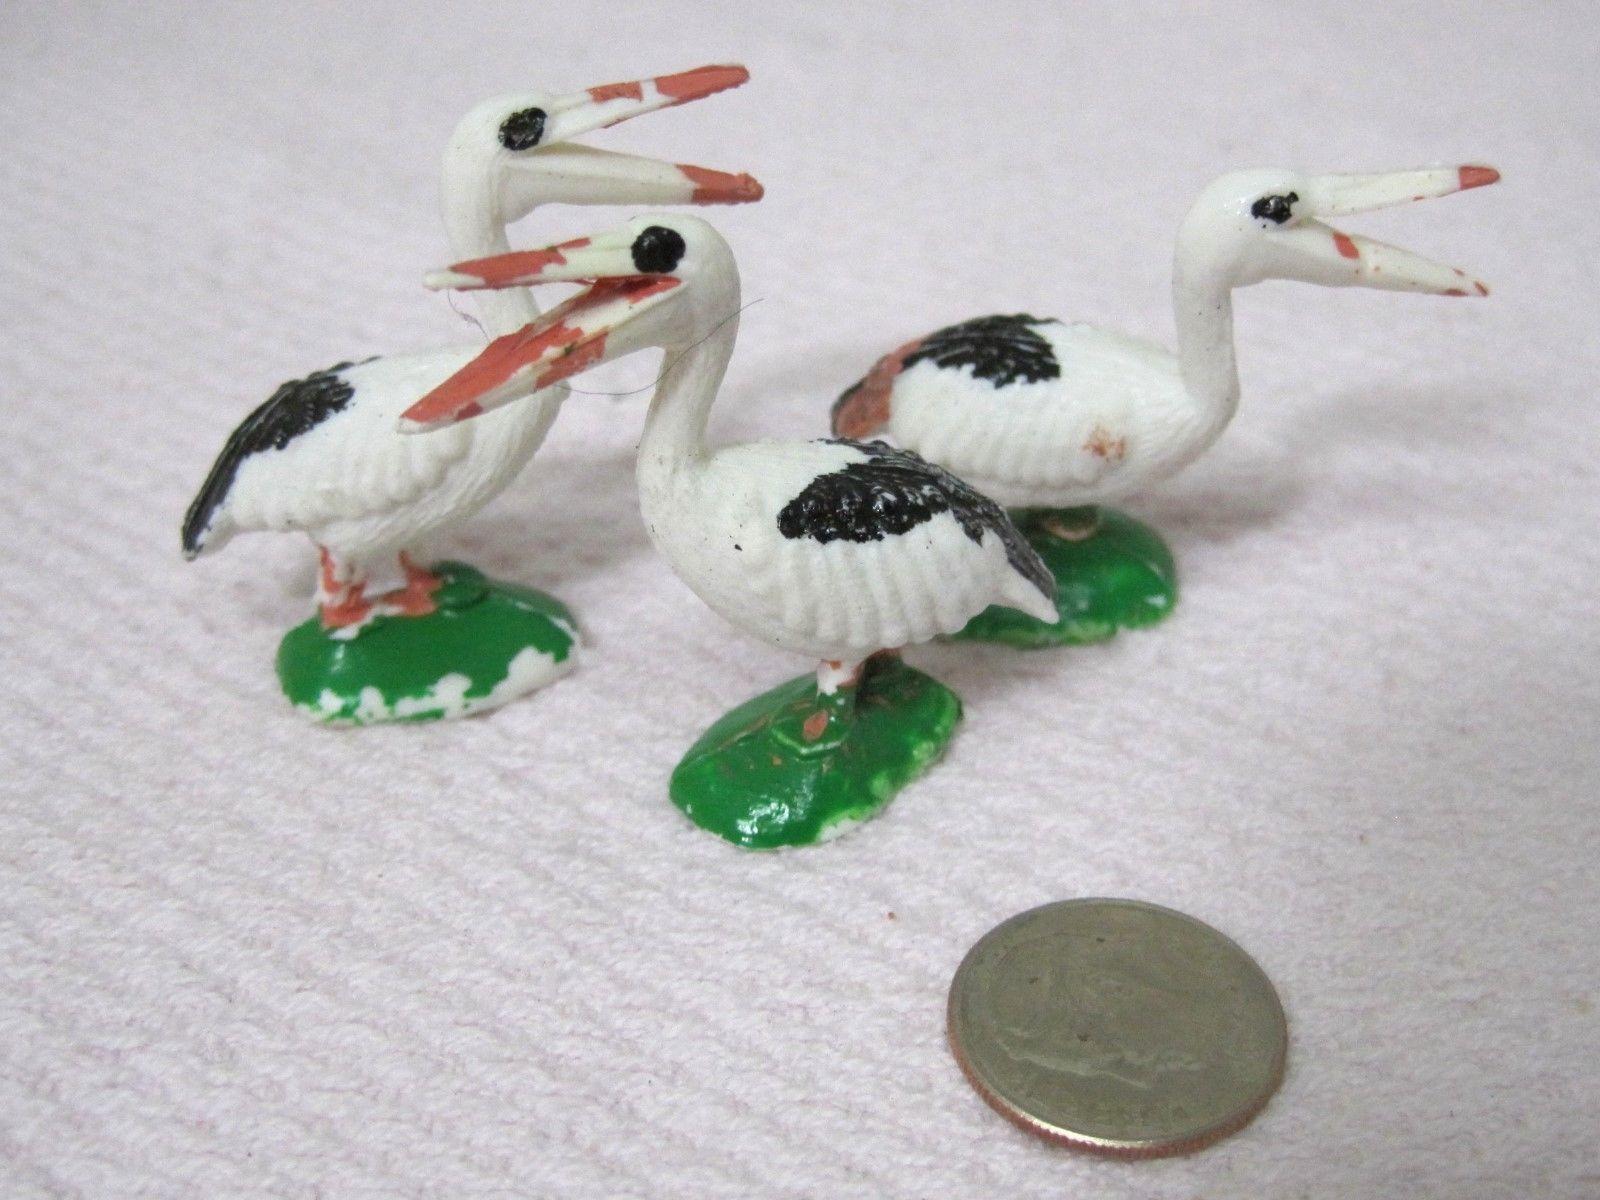 Vintage Miniature Bird Stork Pelican 1 5/8 x 1 1/2  Inches  Crafts 3 PC